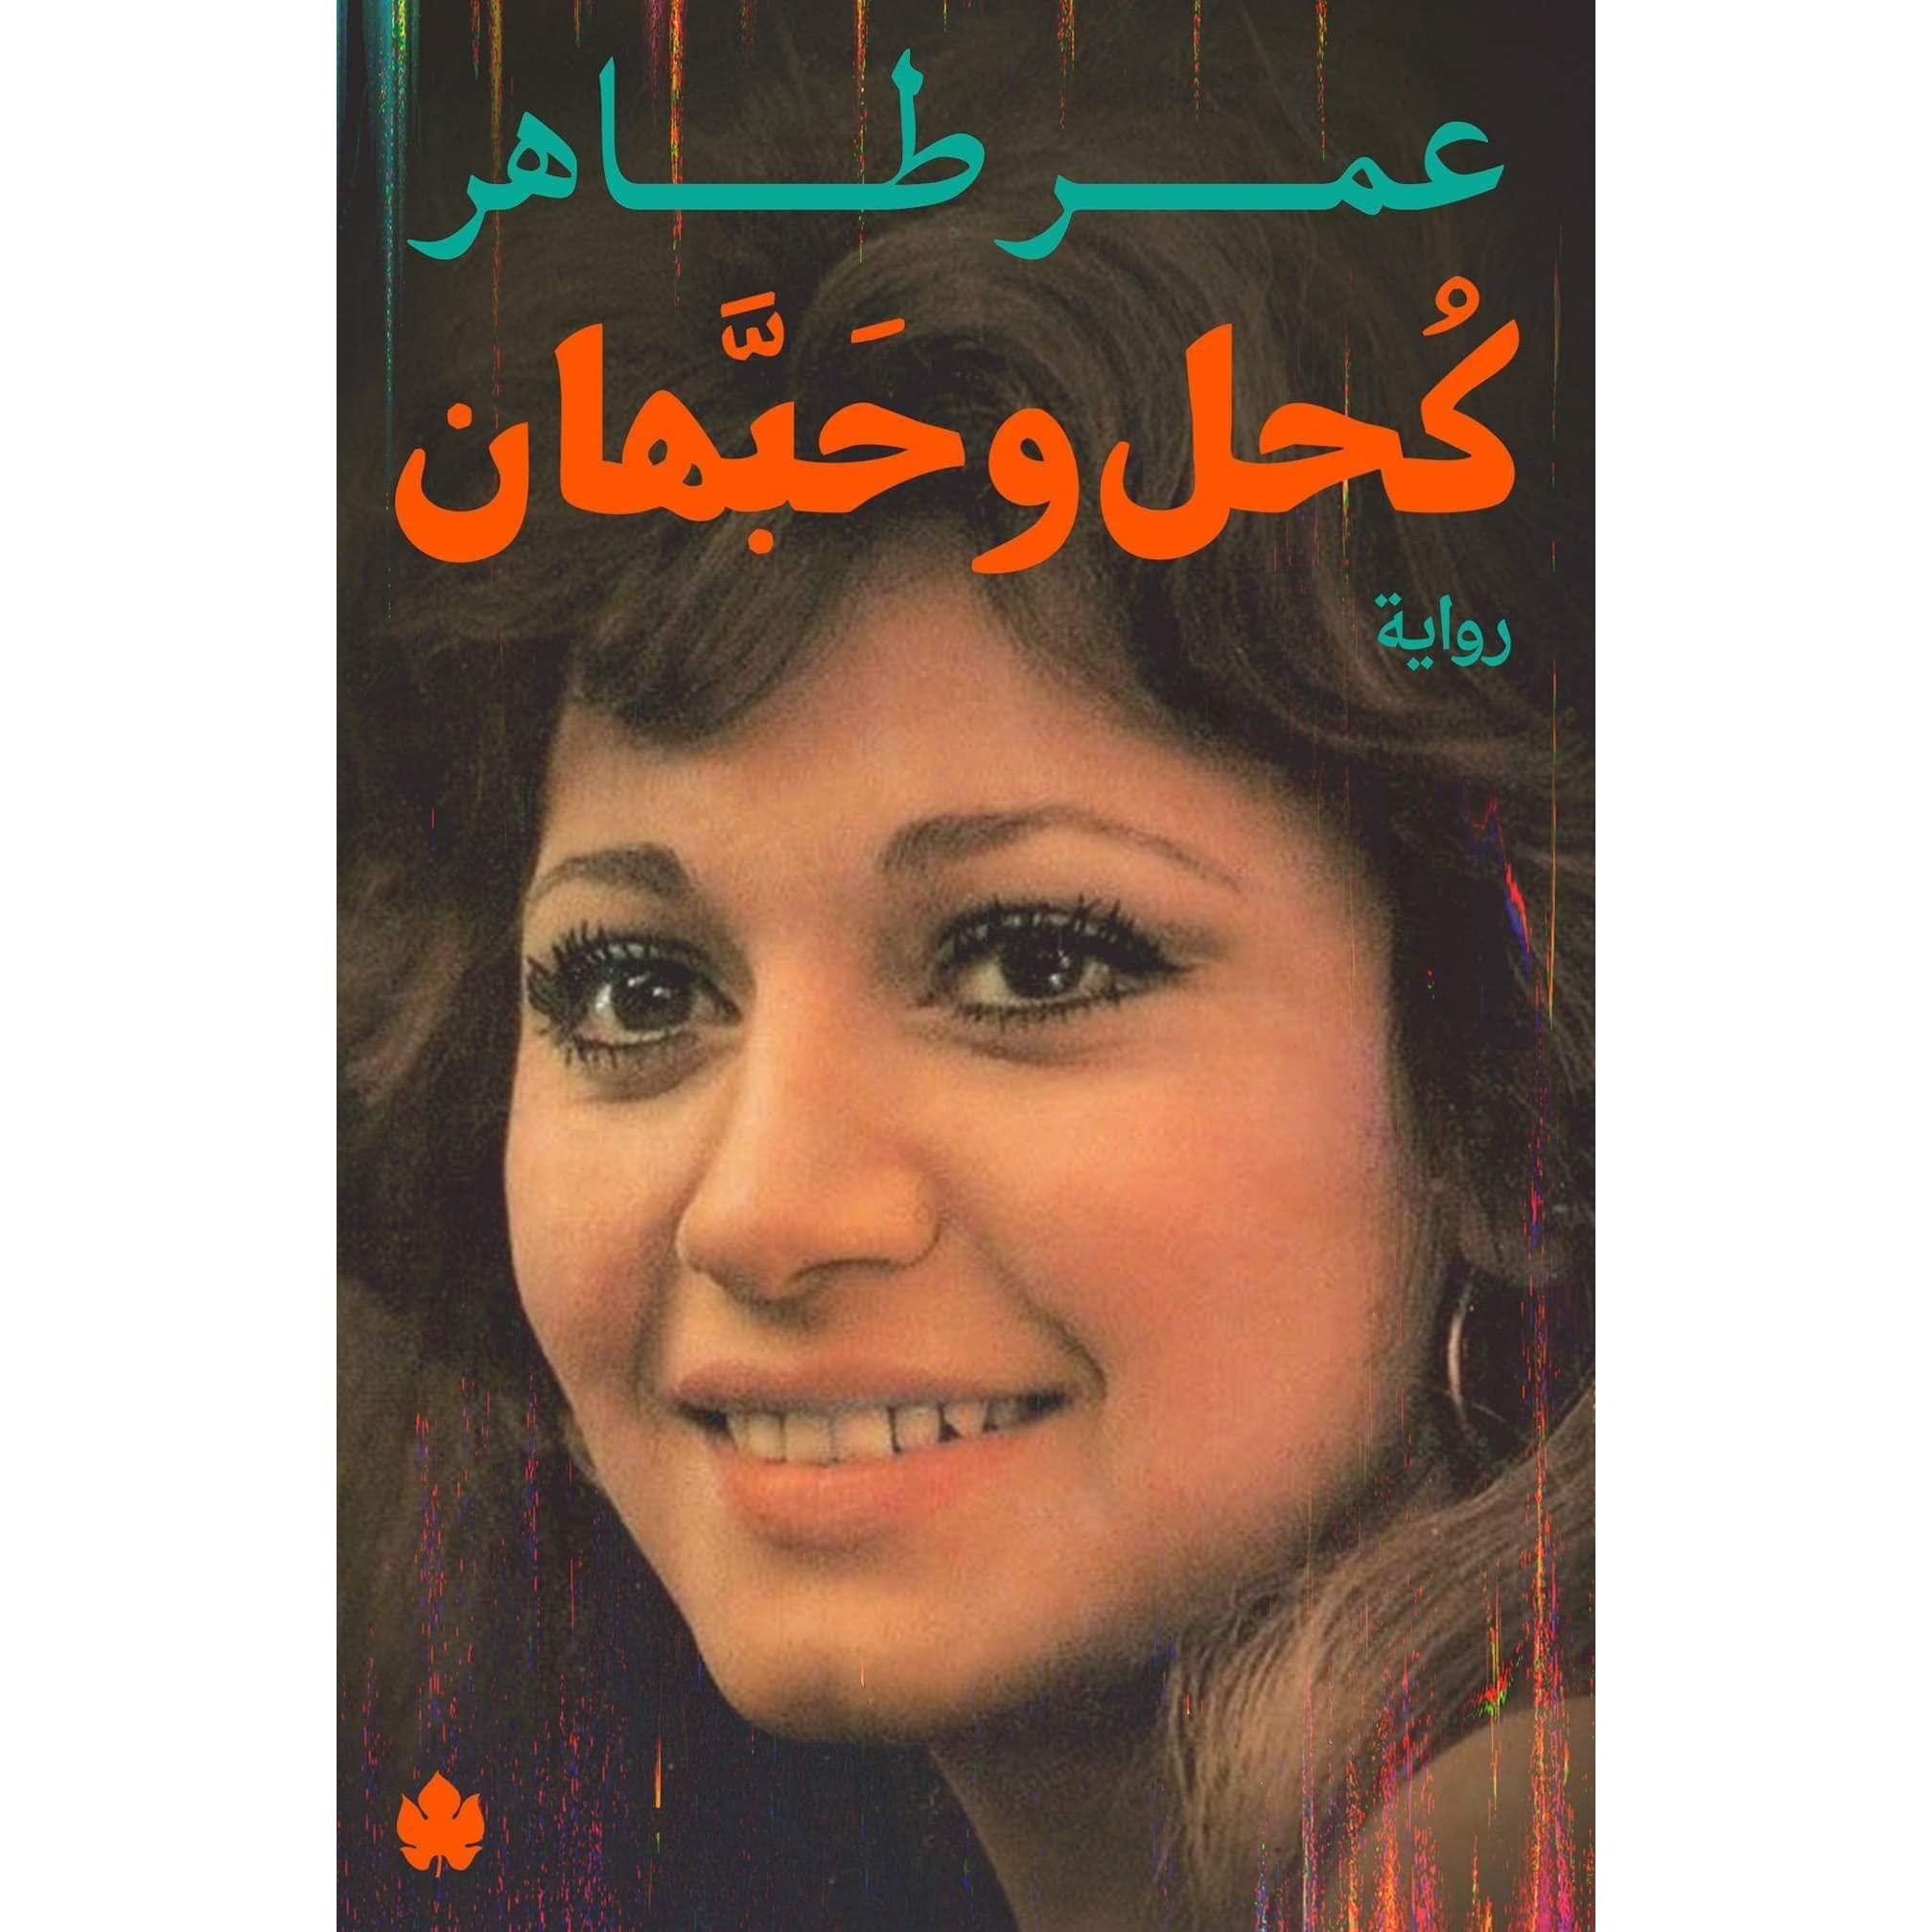 كتاب كحل وحبهان - عمر طاهر